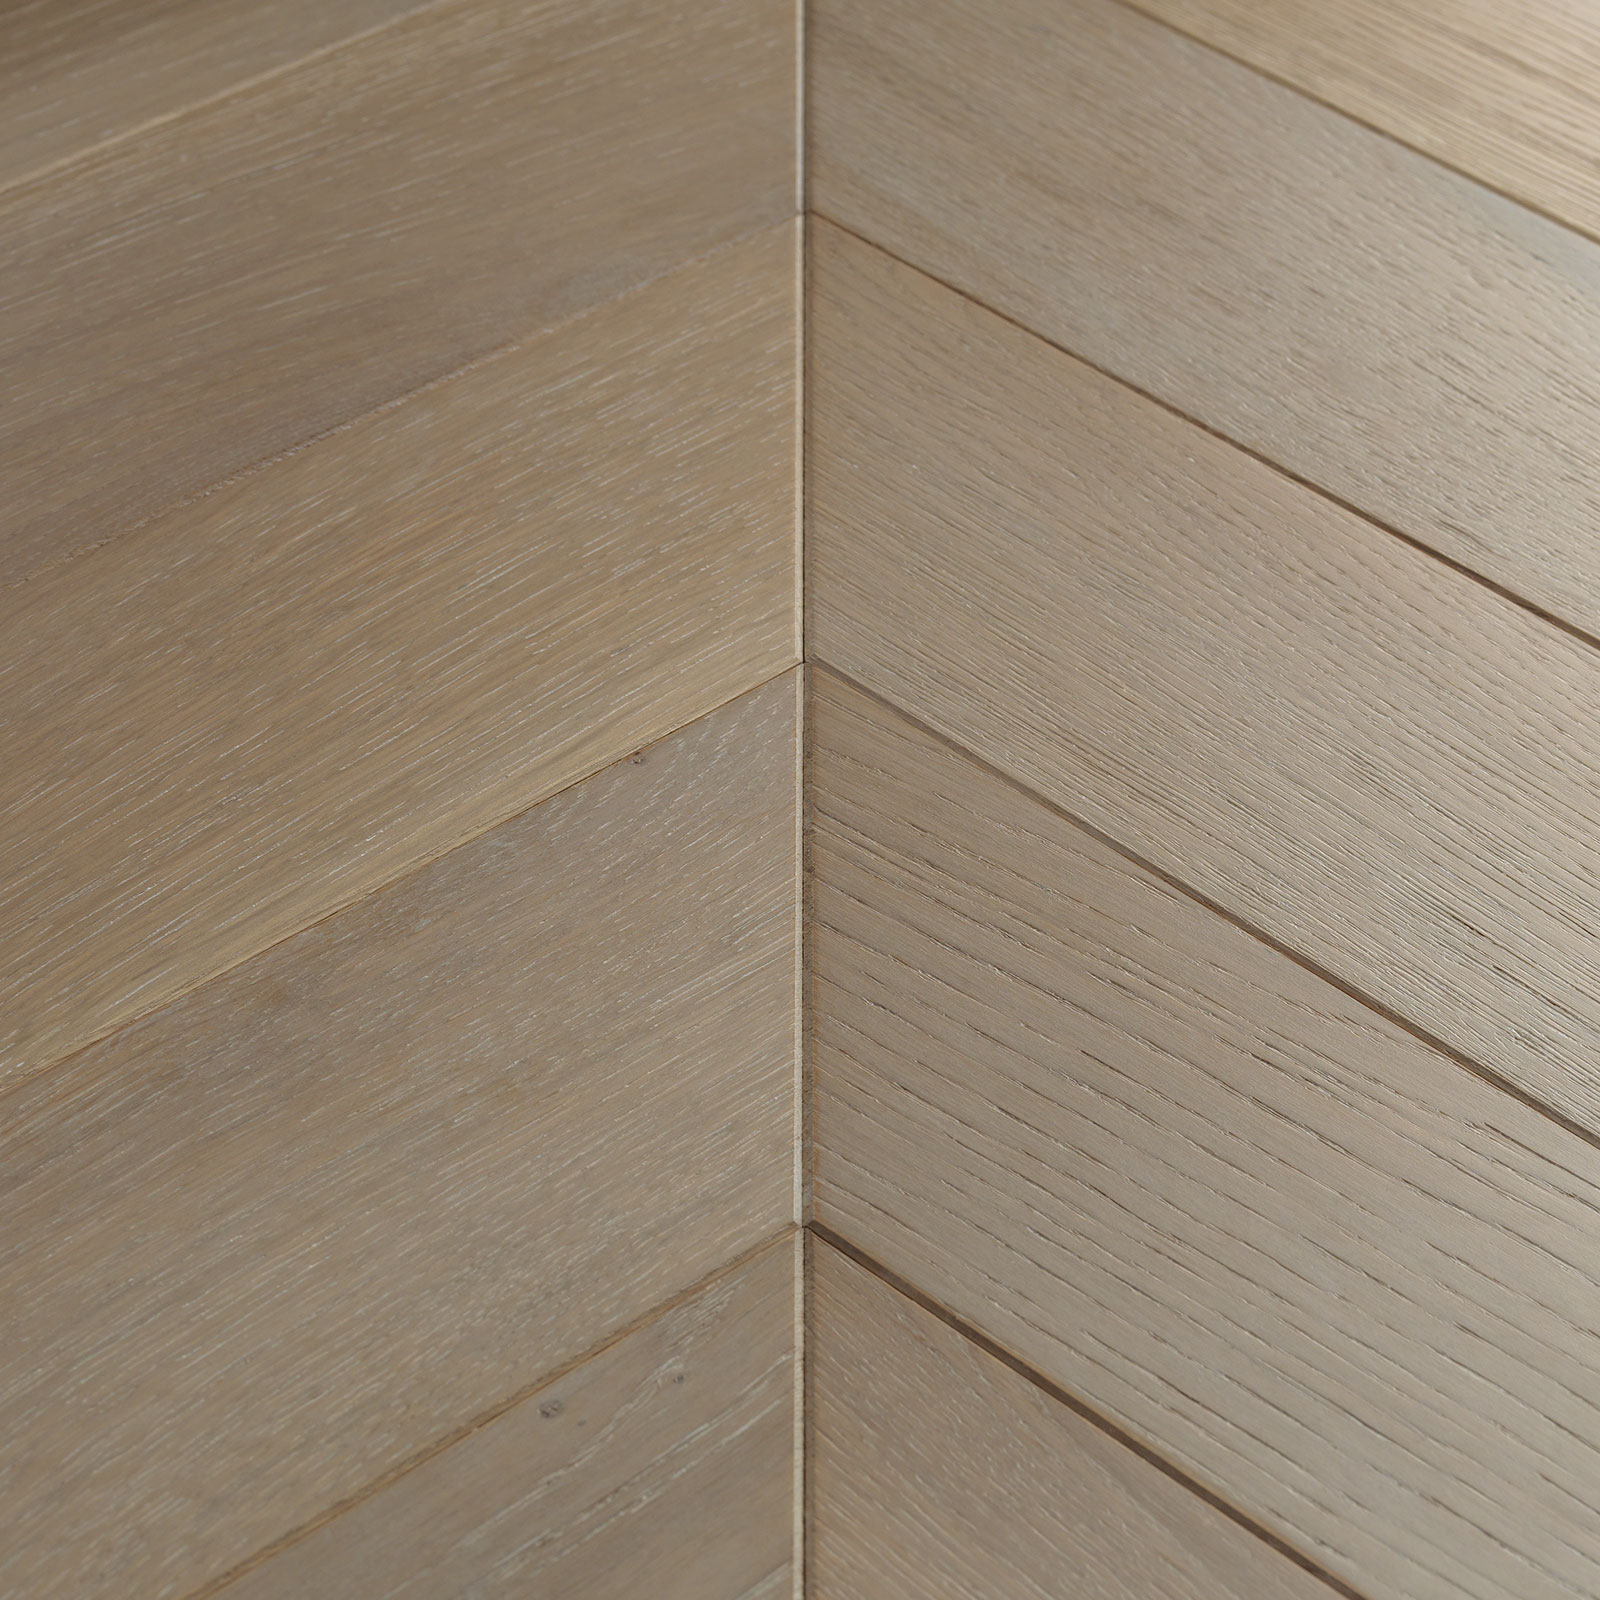 Goodrich Haze Oak Chevron Woodpecker Flooring Professional